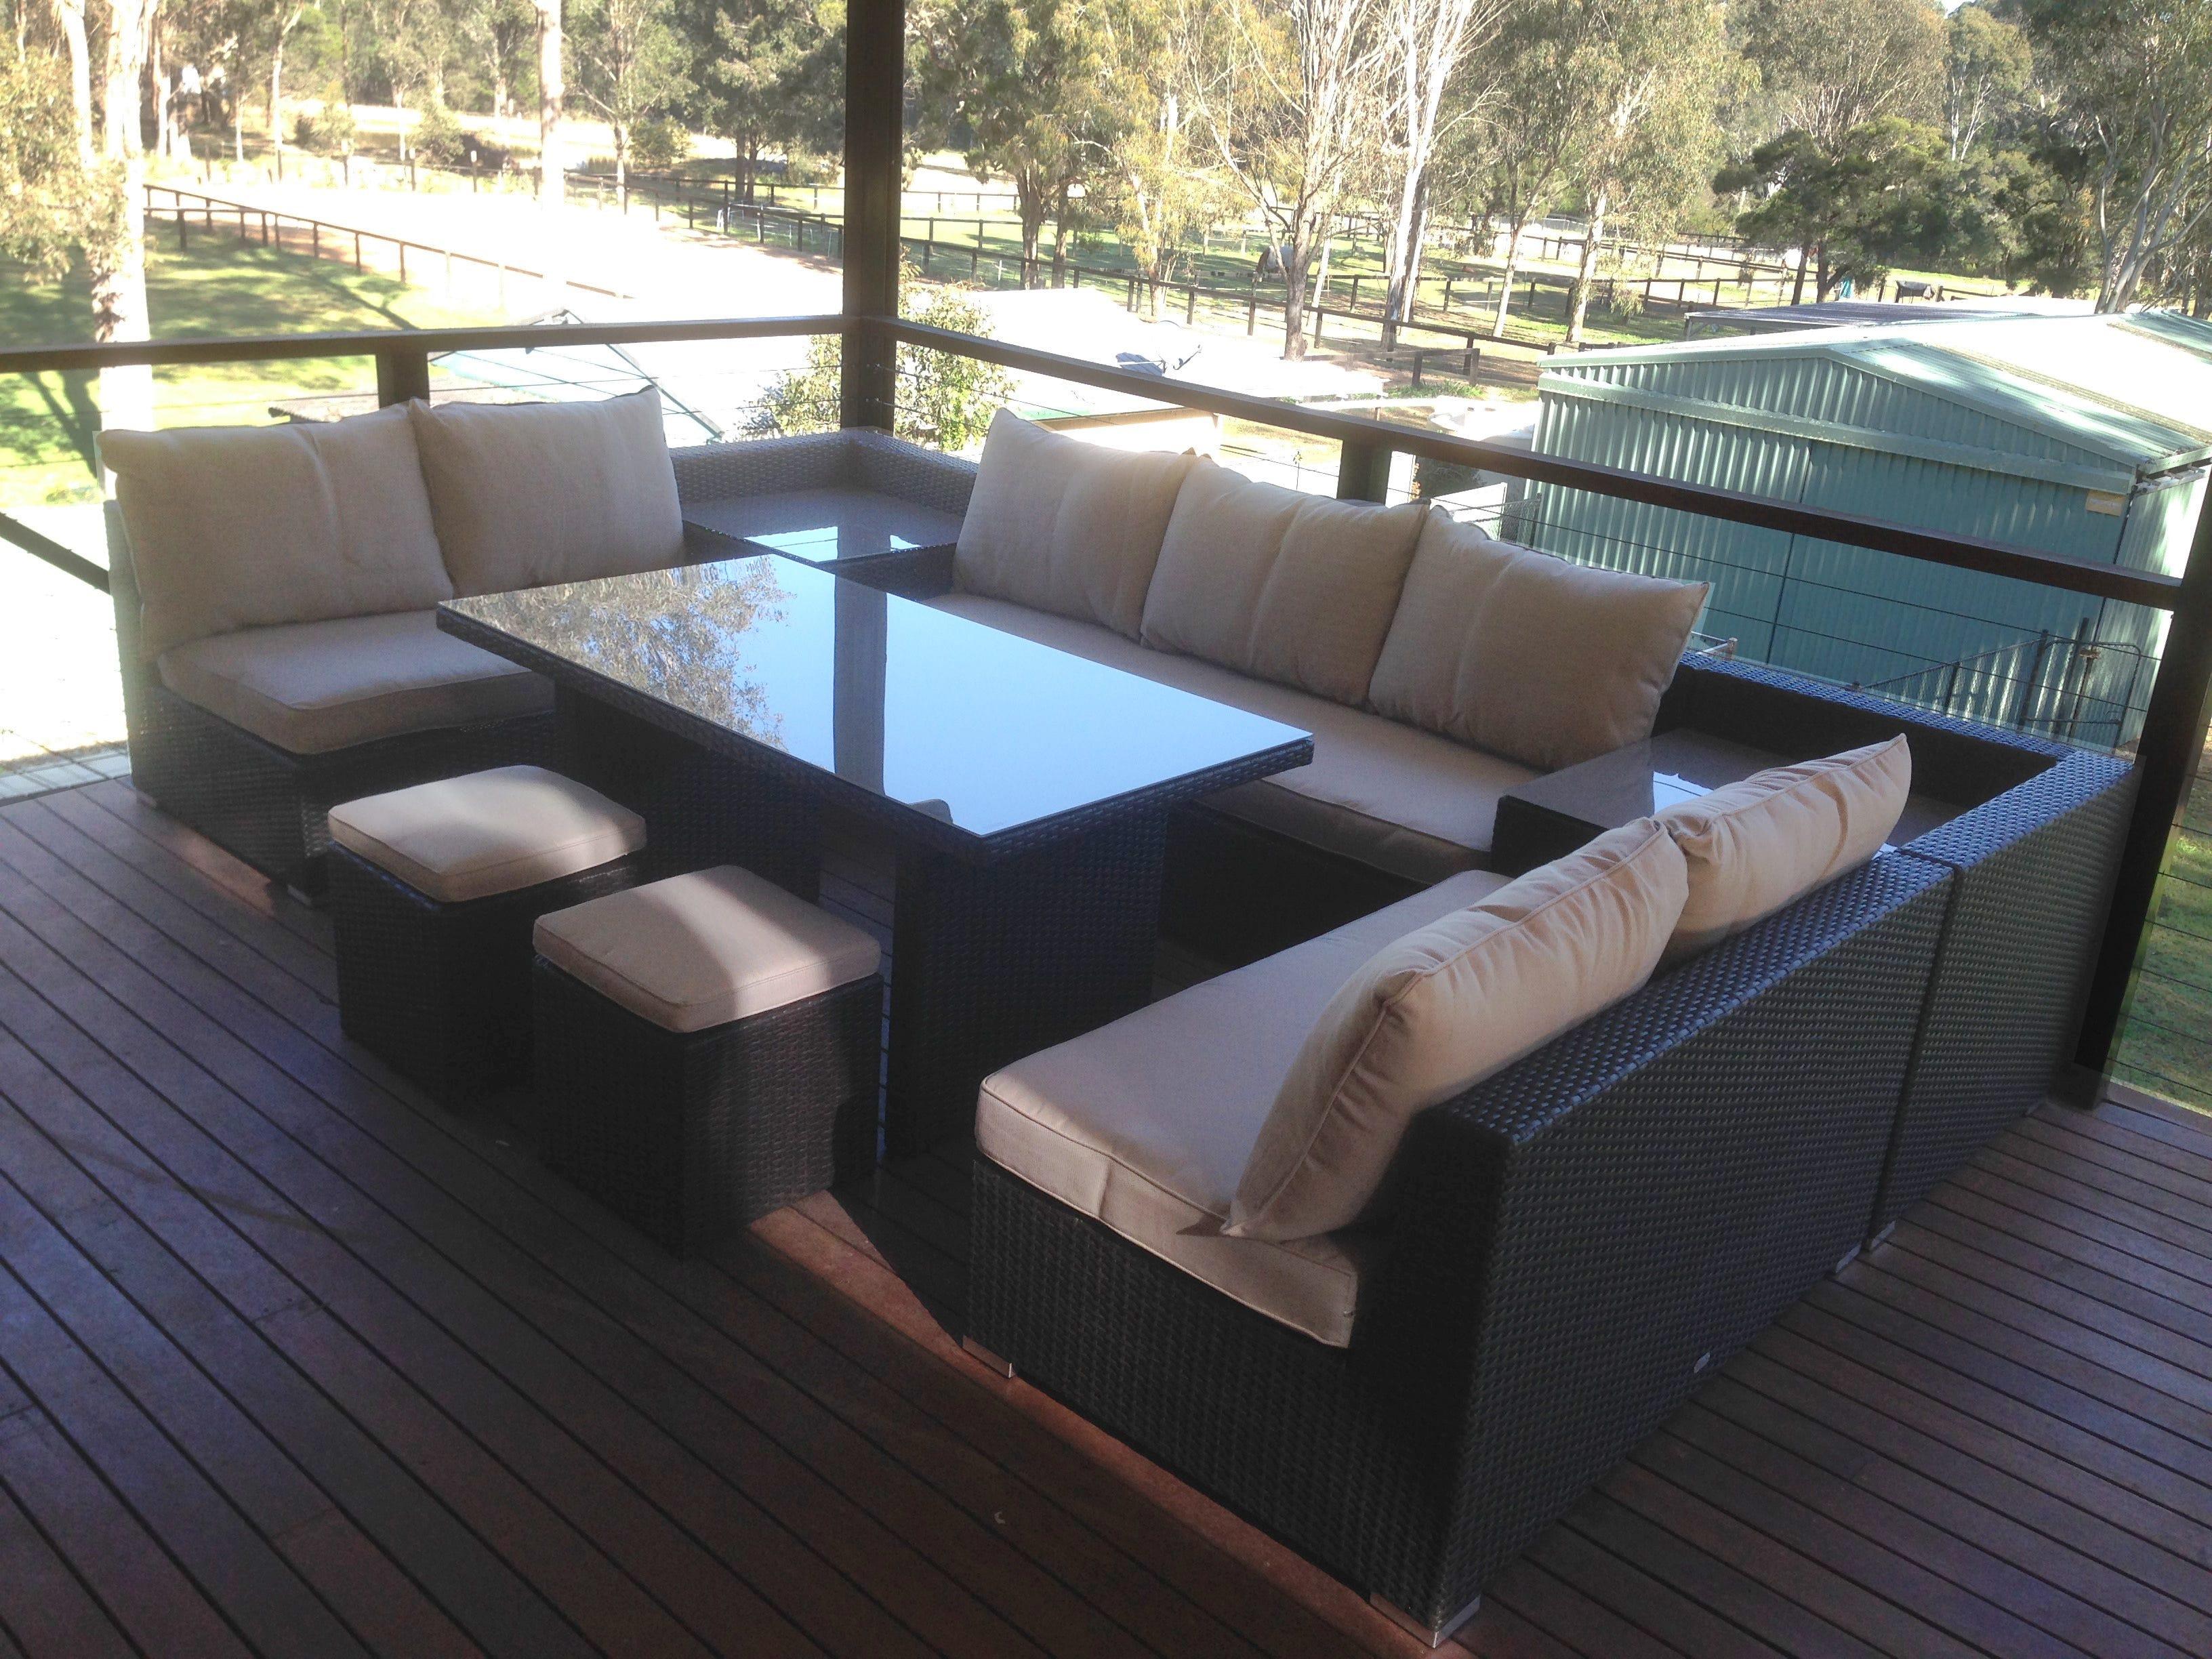 Merveilleux Outdoor Lounge Wicker Como Casual Dining Susan Maraylya